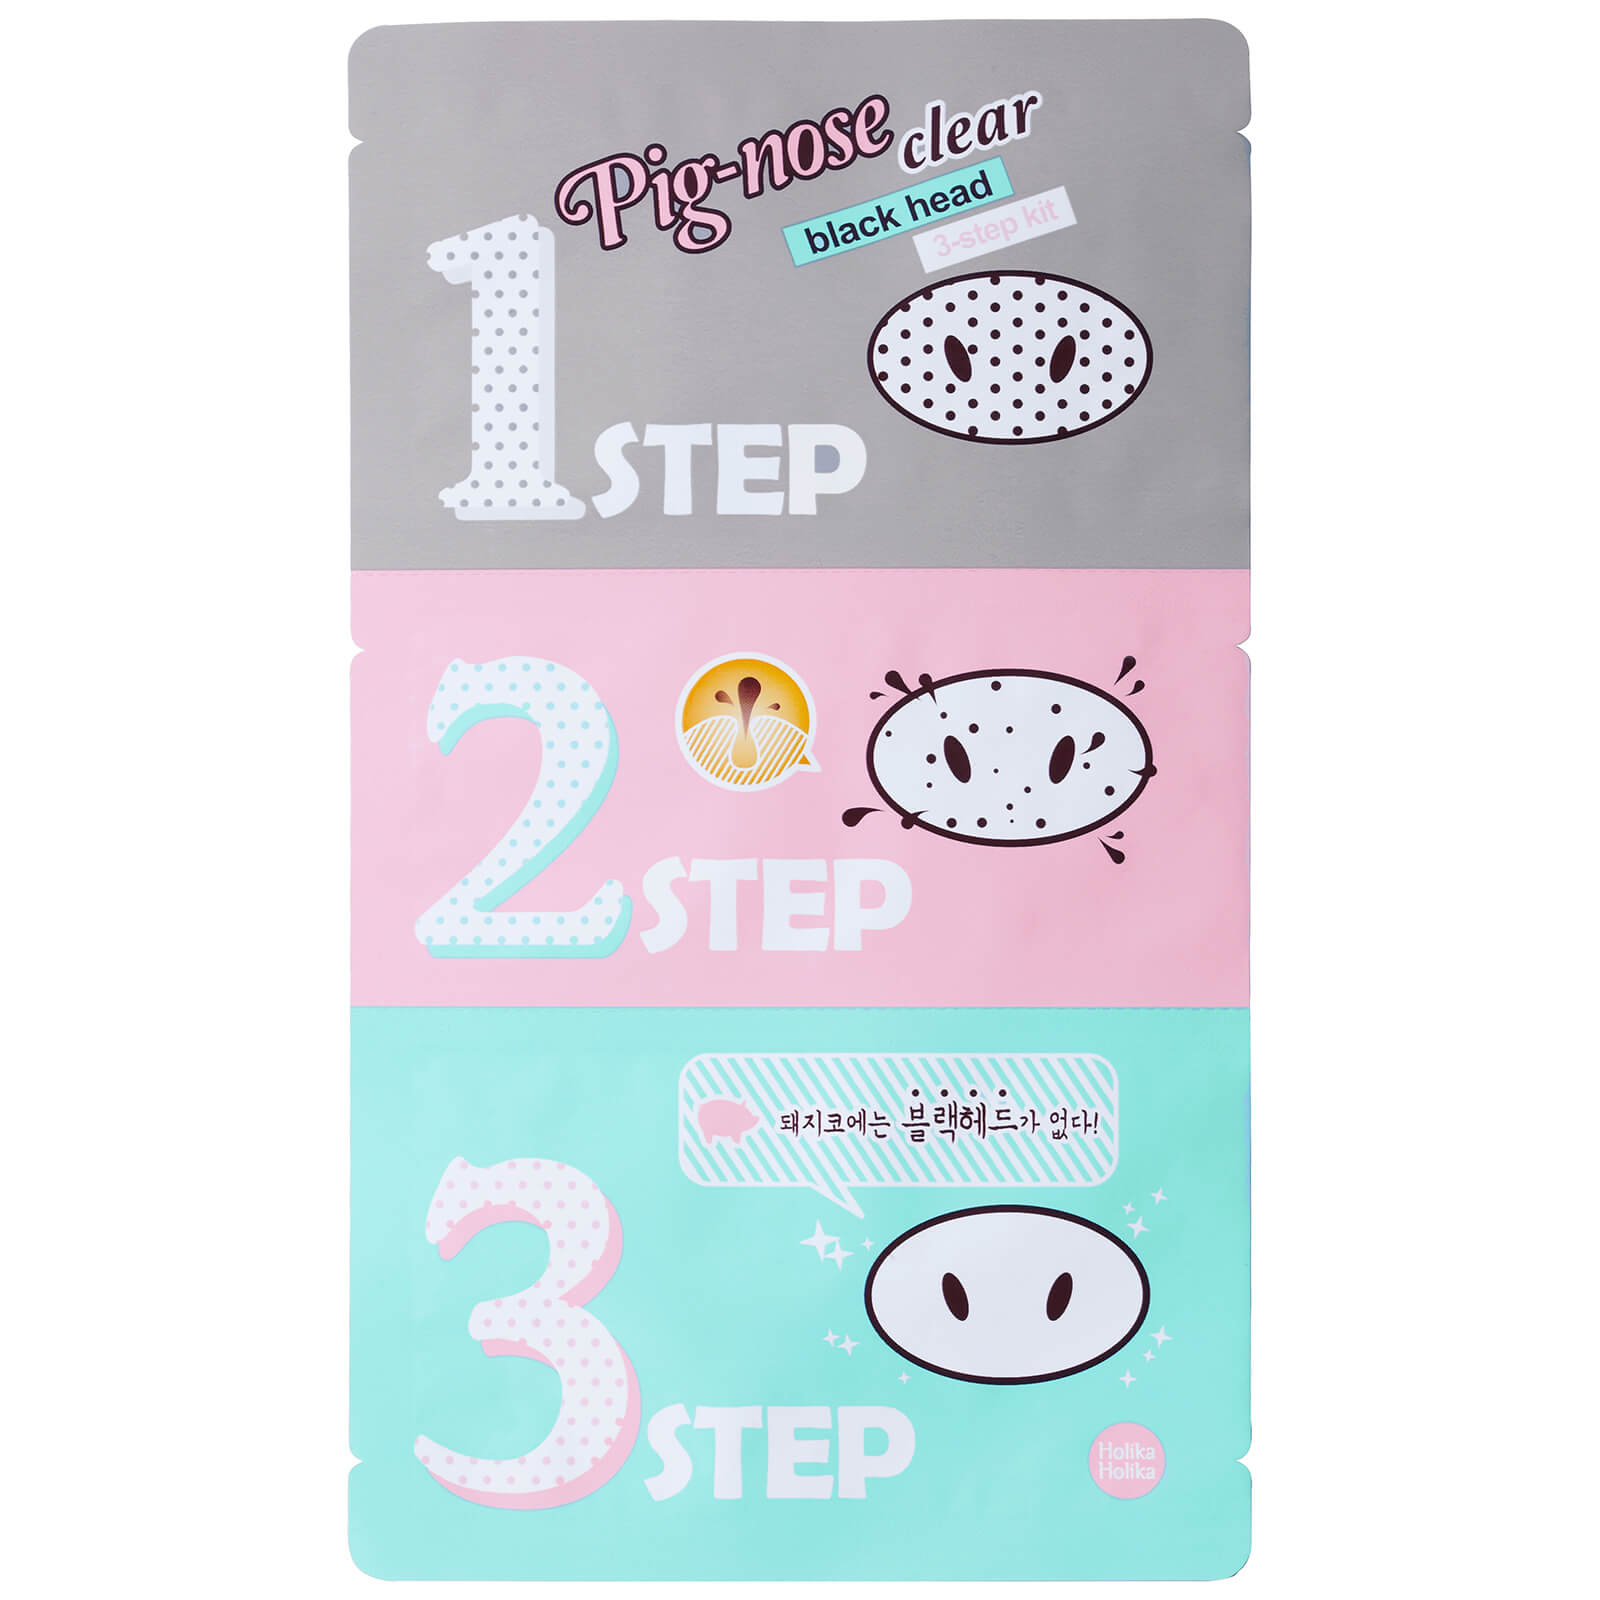 Купить Holika Holika Pig Nose Clear Blackhead 3-Step Kit